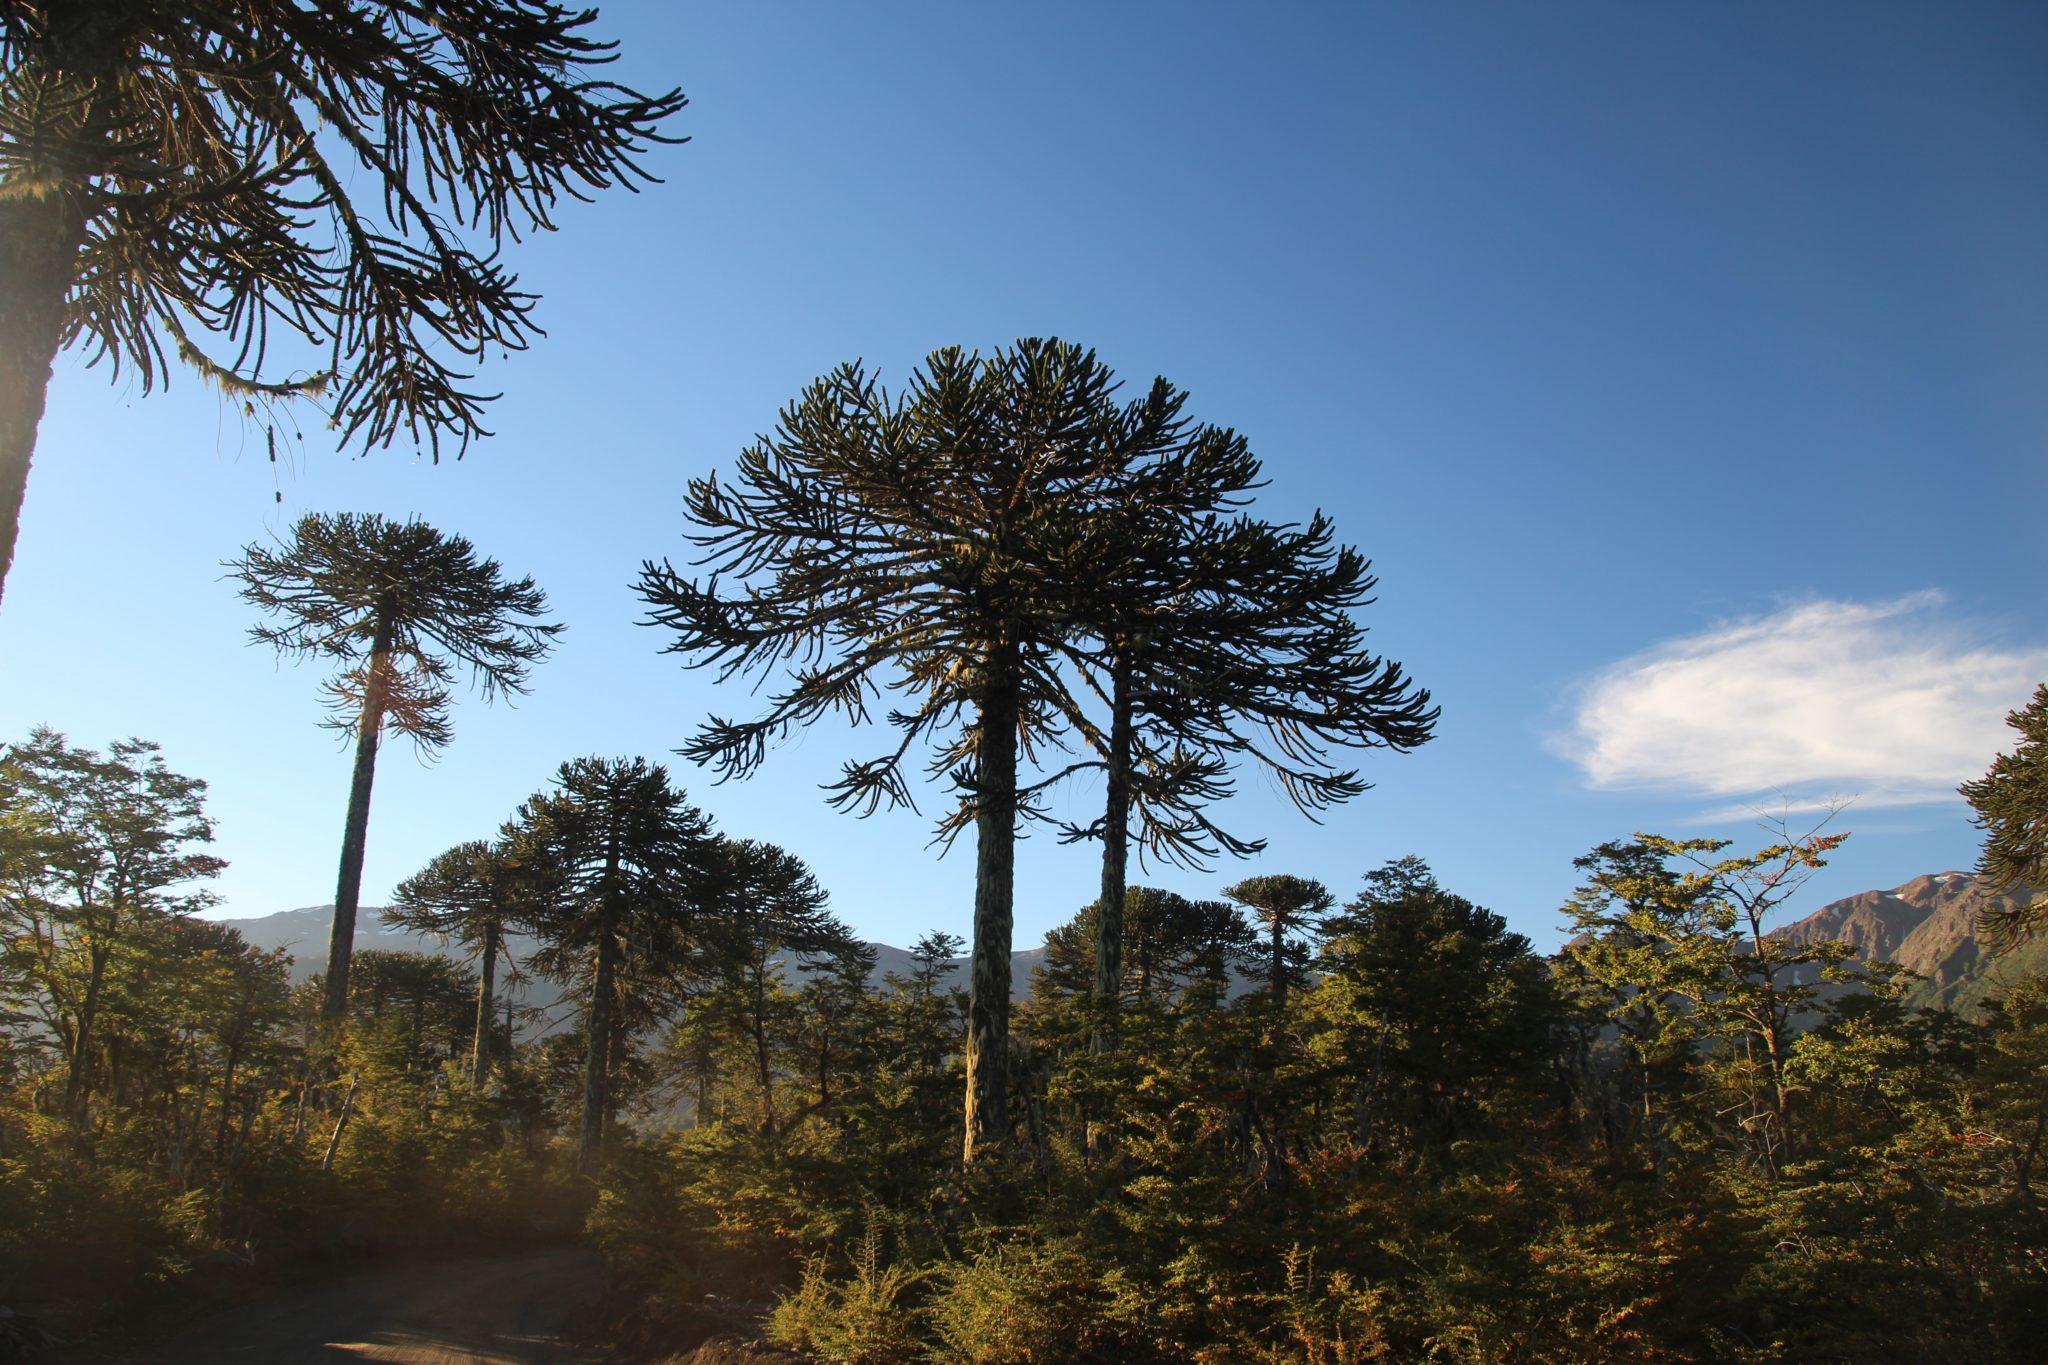 araucaria arbres natifs chili